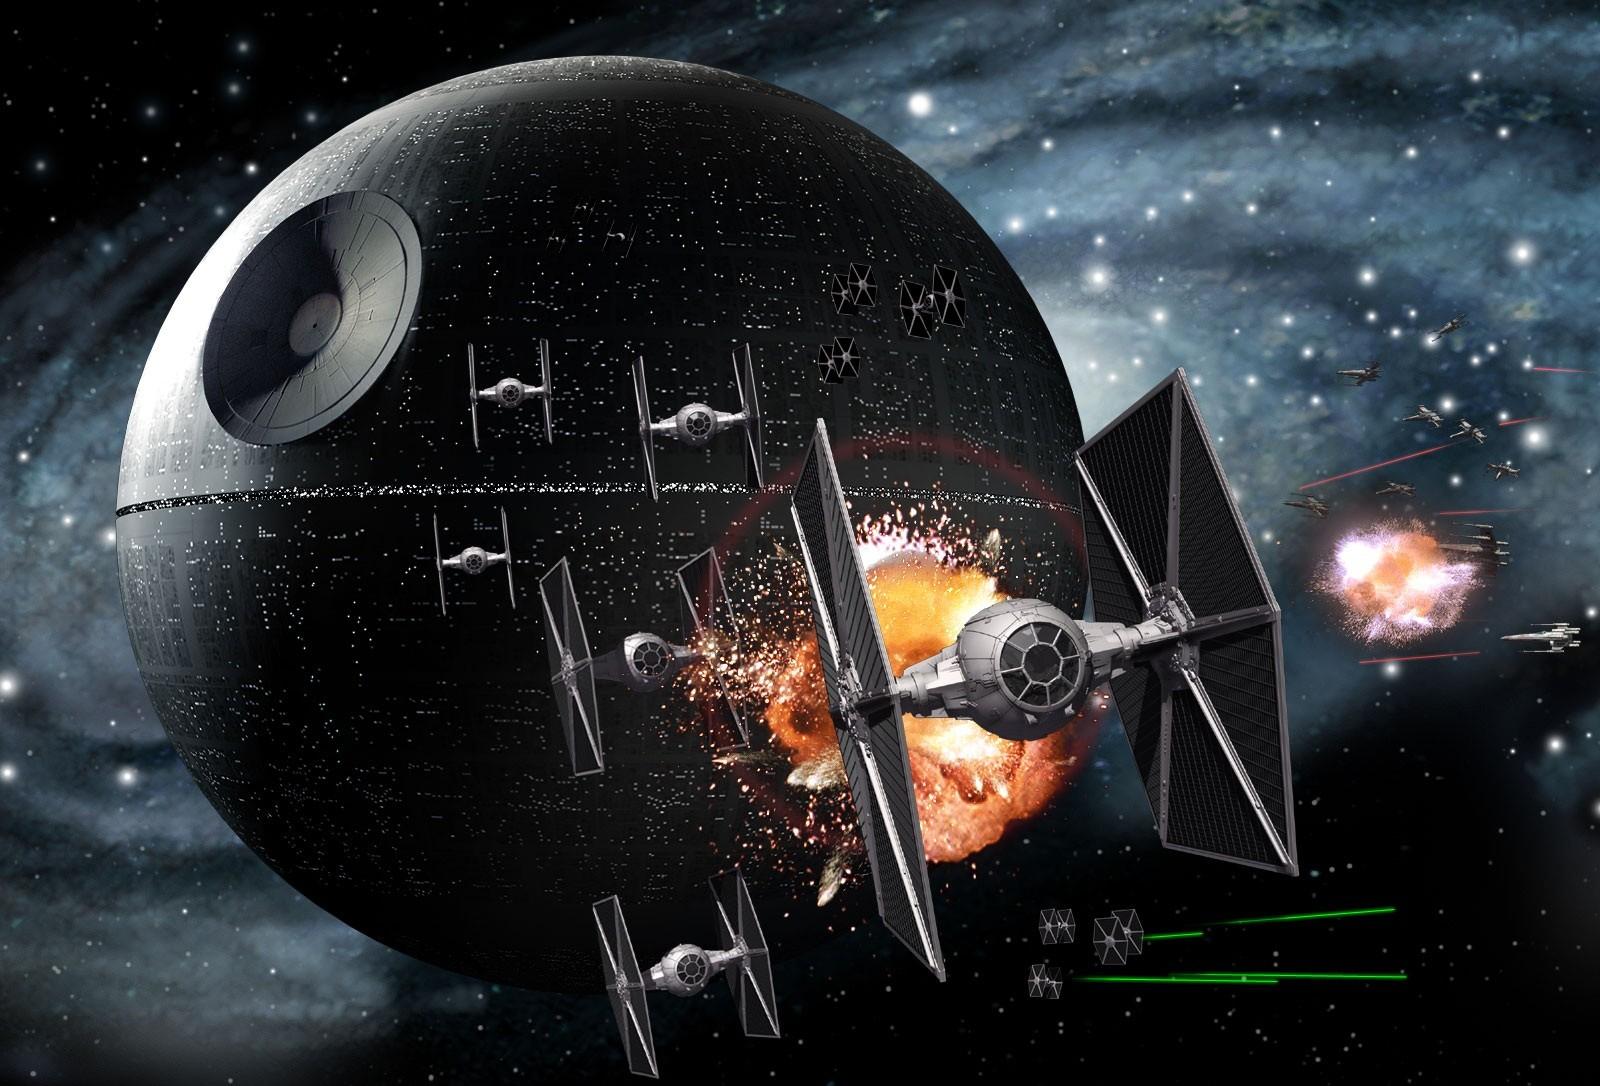 Star Wars Hd Desktop Wallpapers New Hd Wallpapers Star Wars Zoom Background 1600x1086 Download Hd Wallpaper Wallpapertip